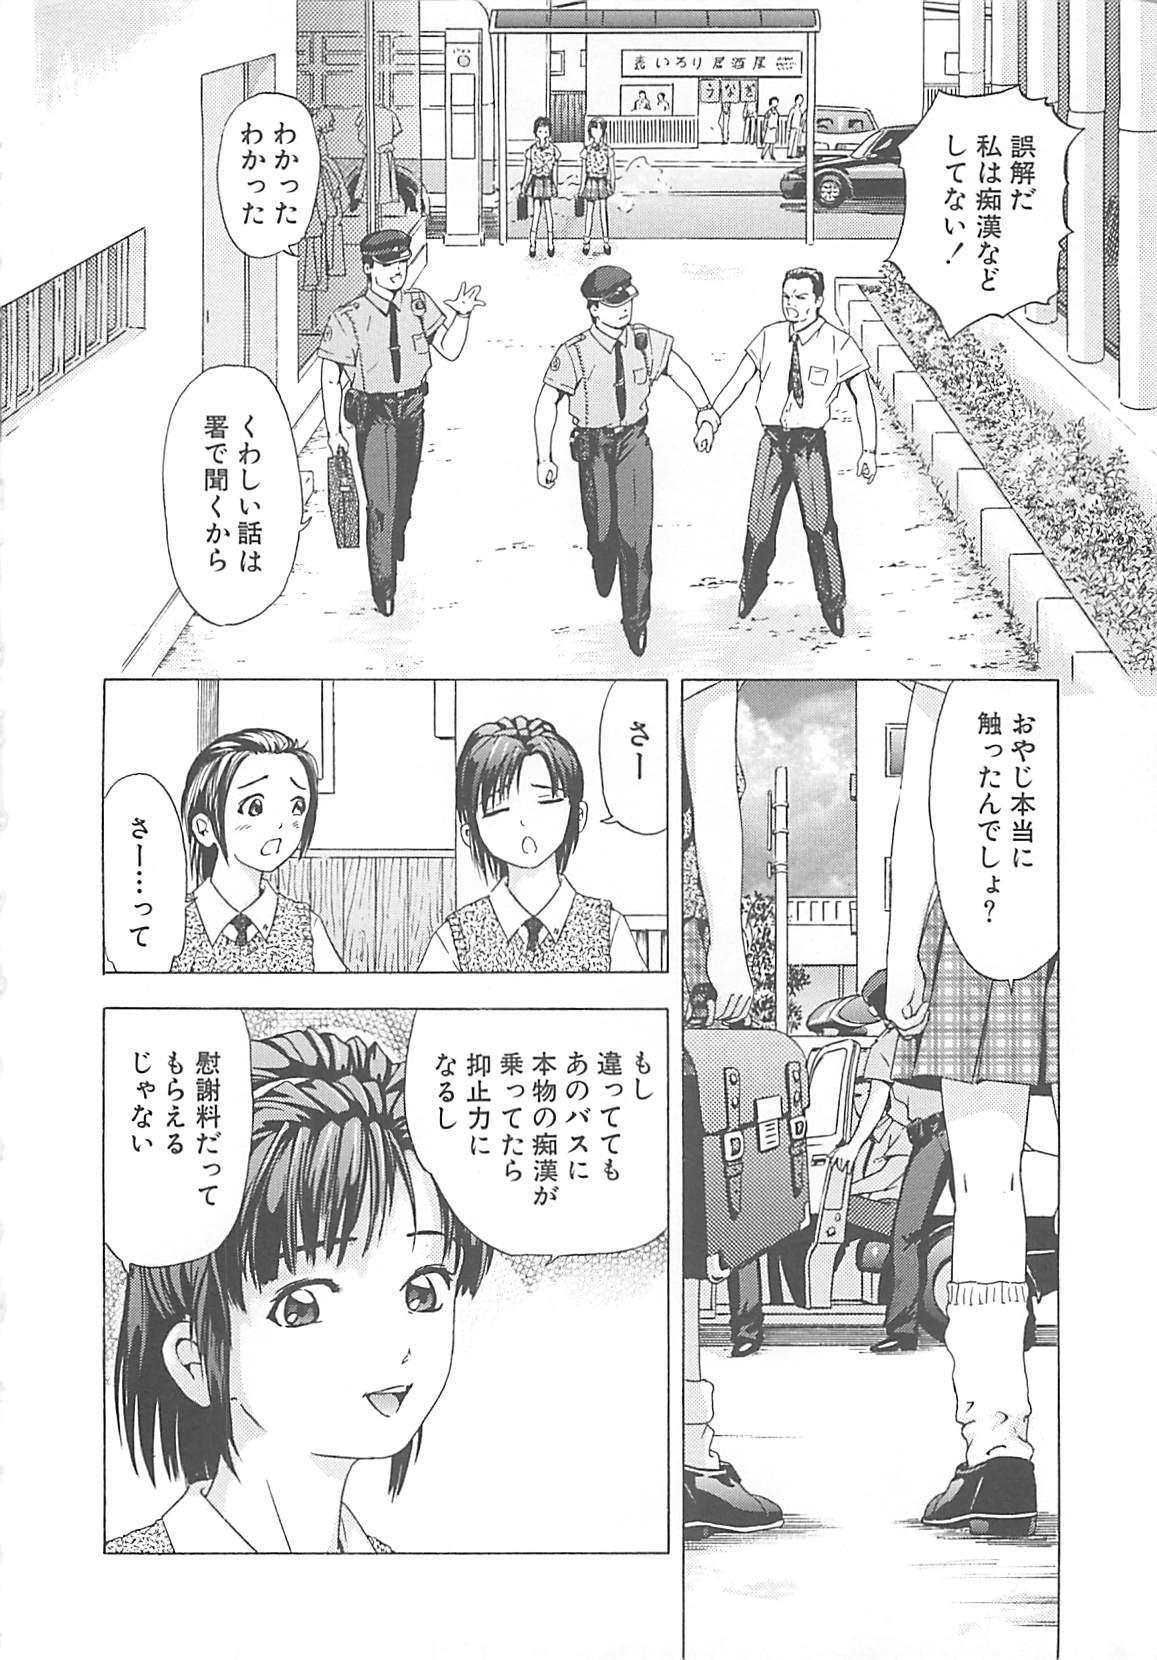 Kanin Kyoushitsu - Adultery Classroom 84